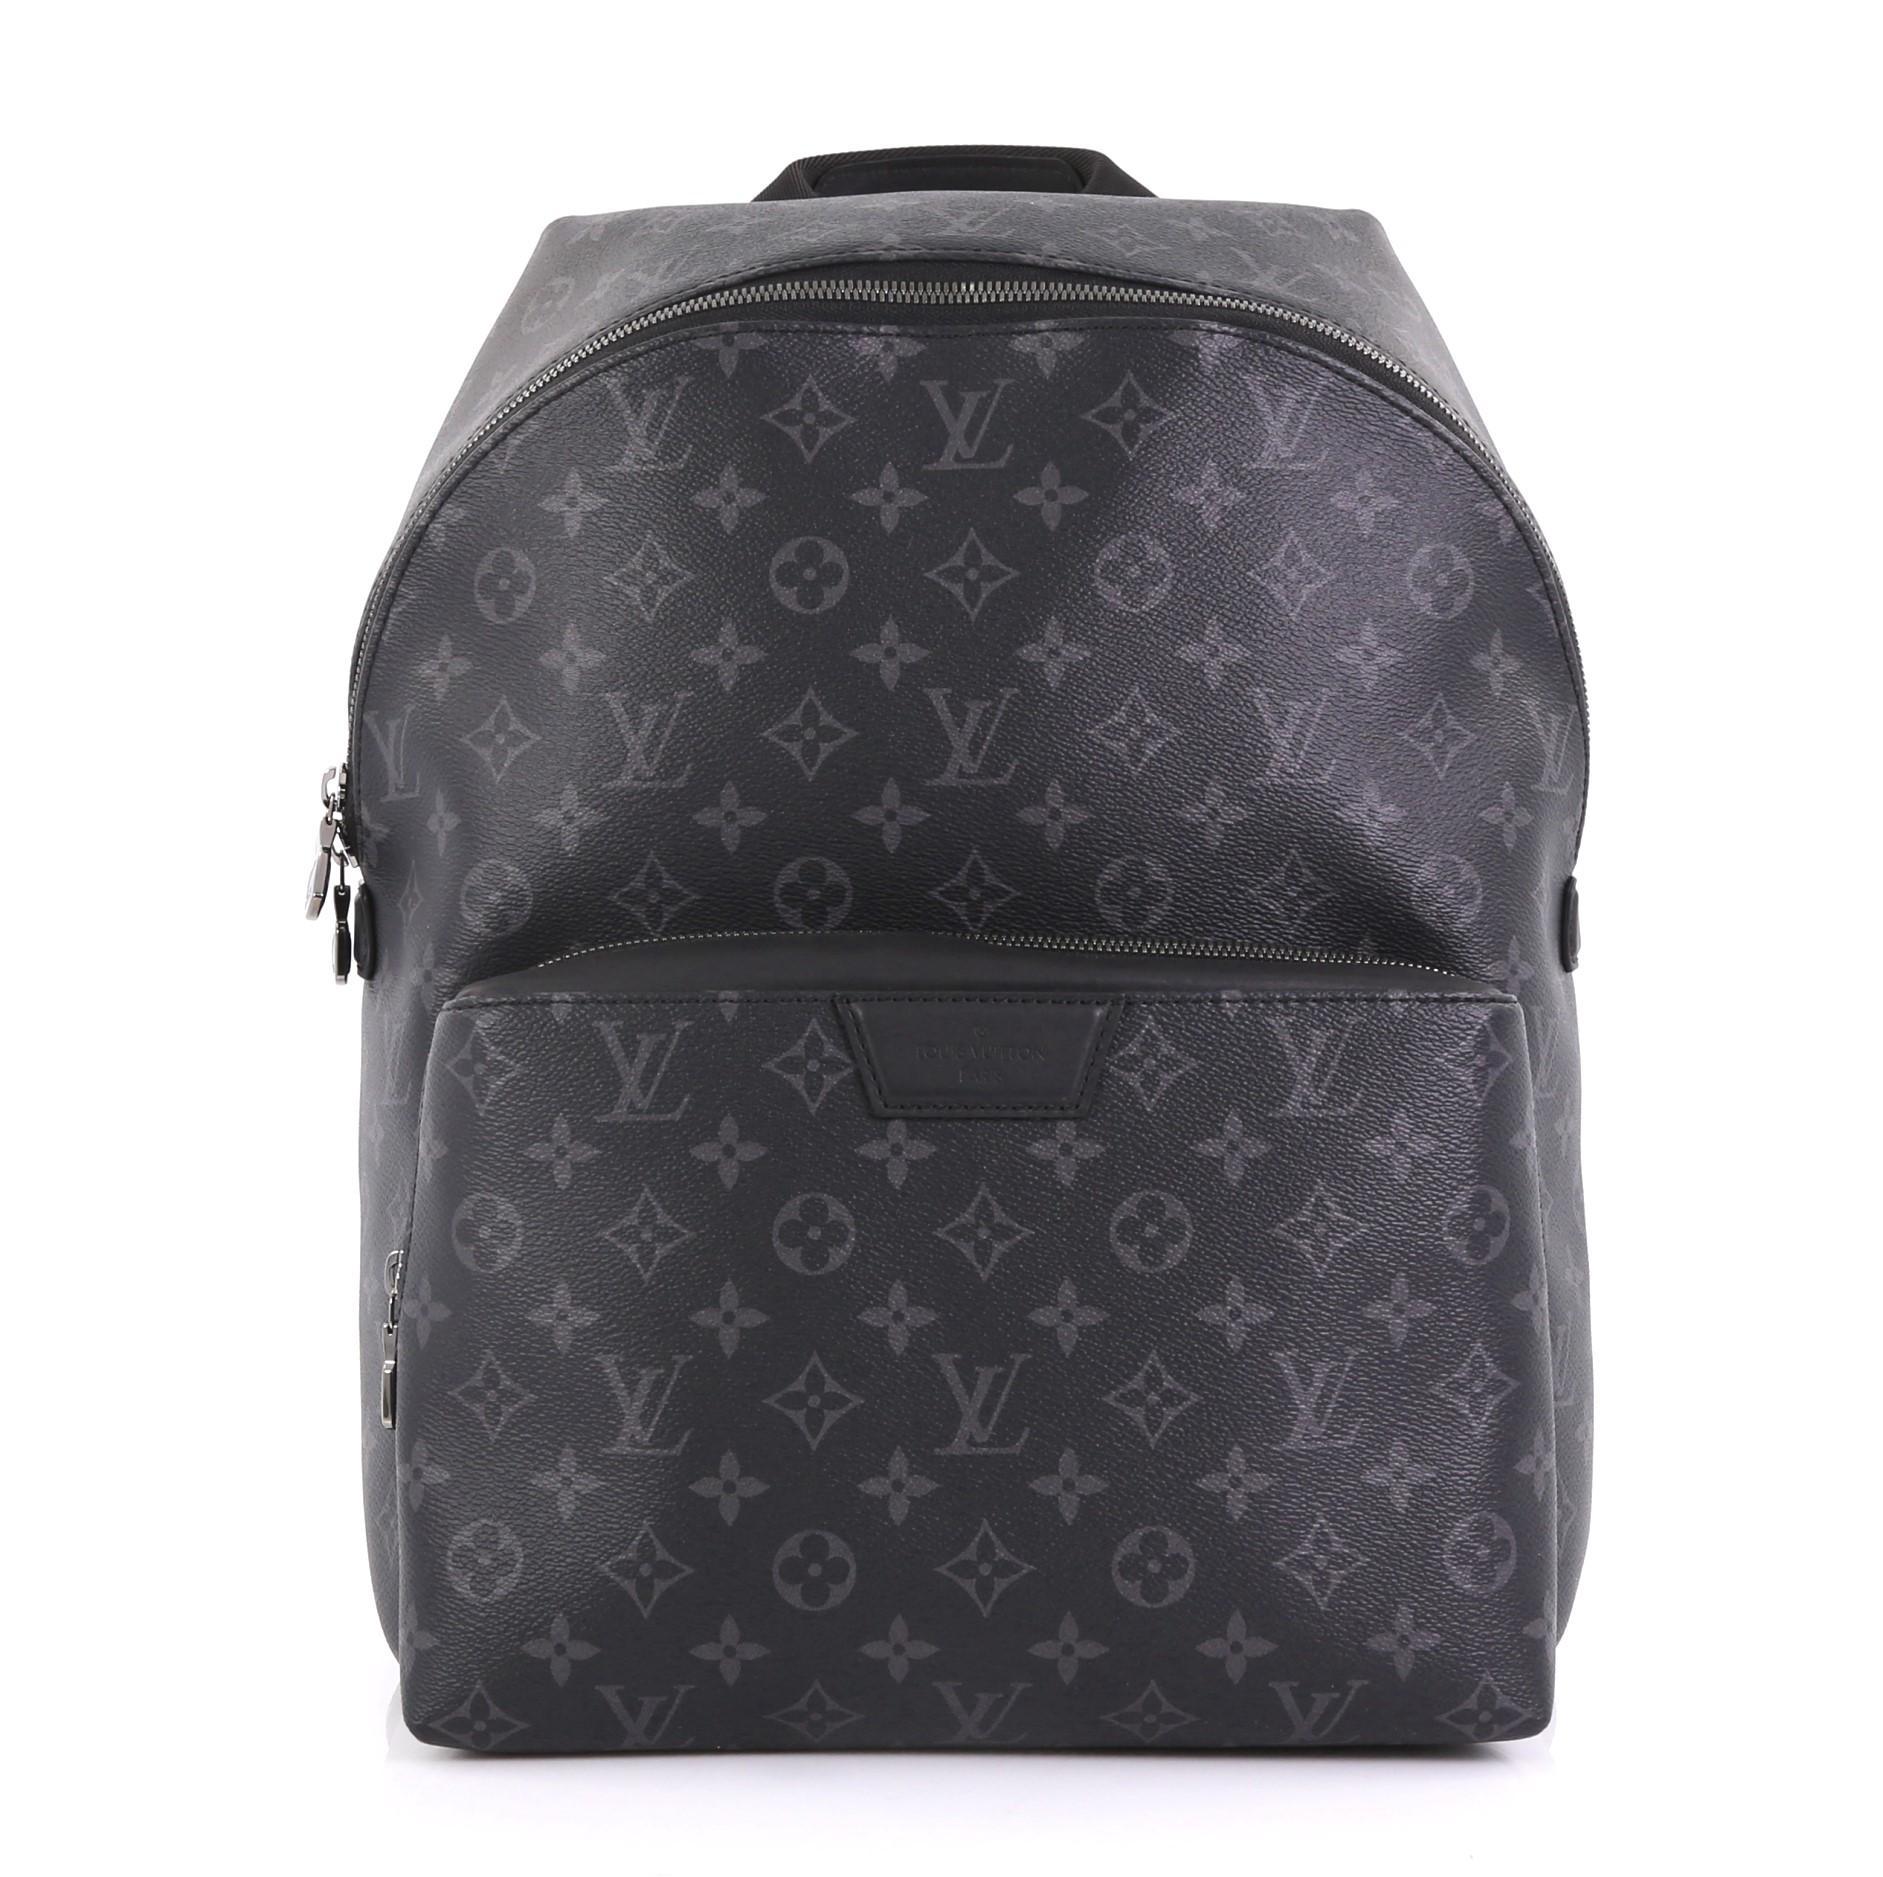 43be0292b650 Rebag Backpacks - 1stdibs